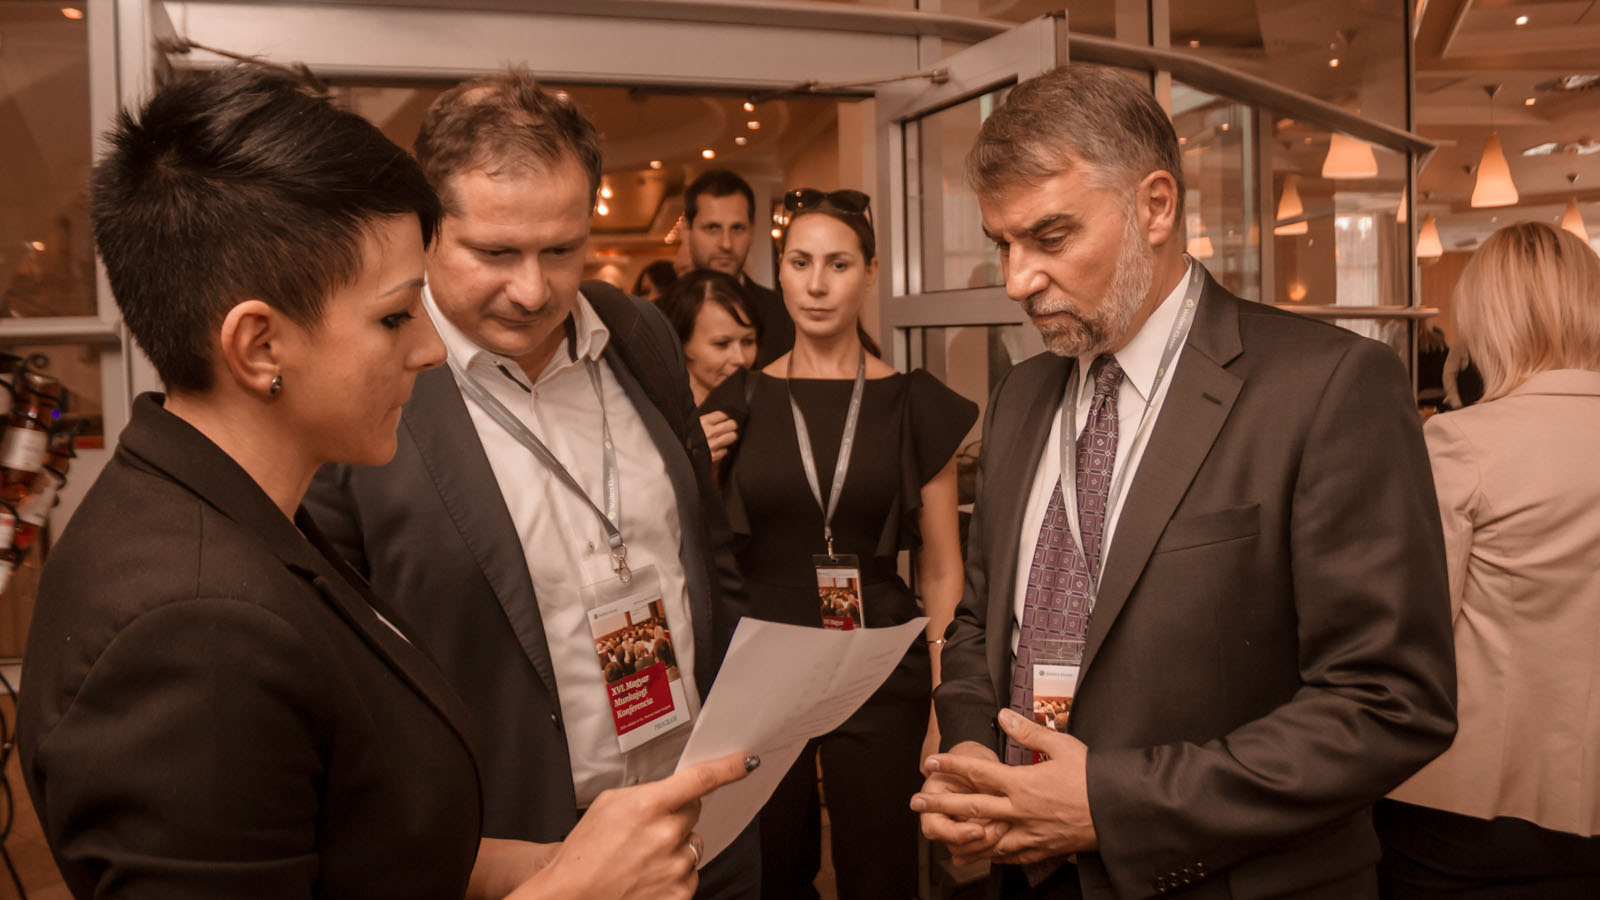 xvi-magyar-munkajogi-konferencia-regisztracio